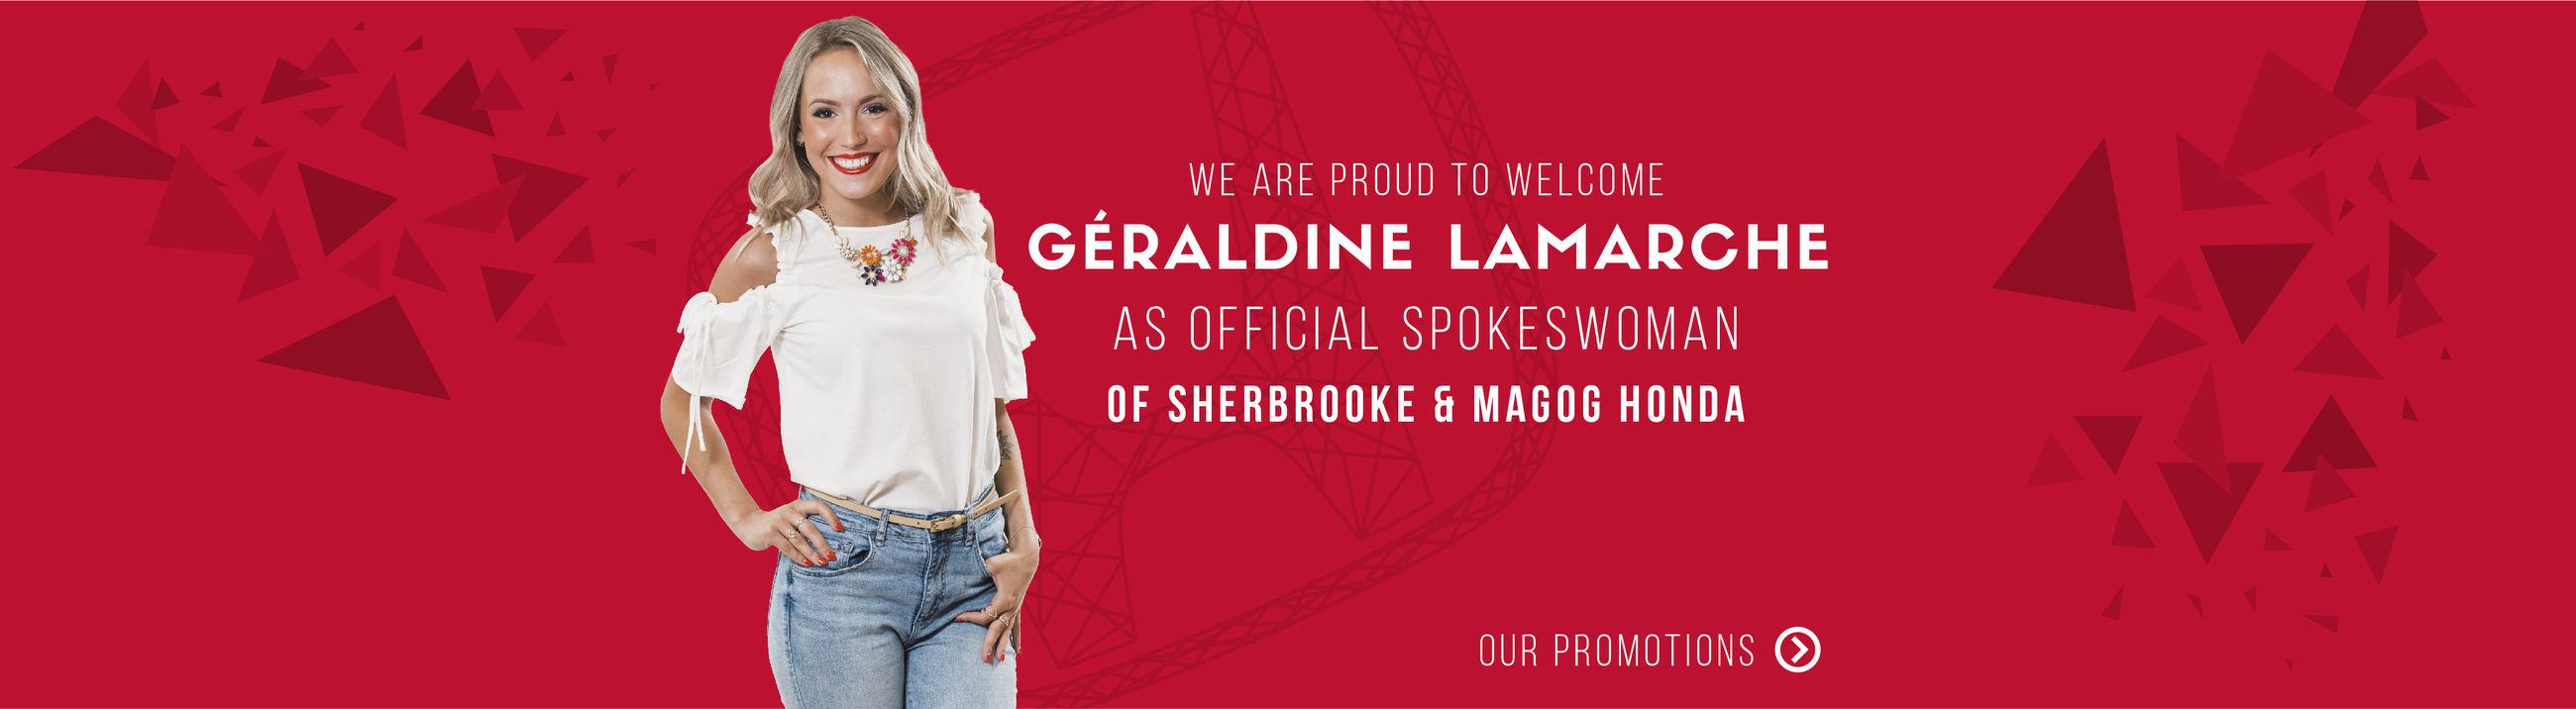 Géraldine Lamarche - Official spokeswoman